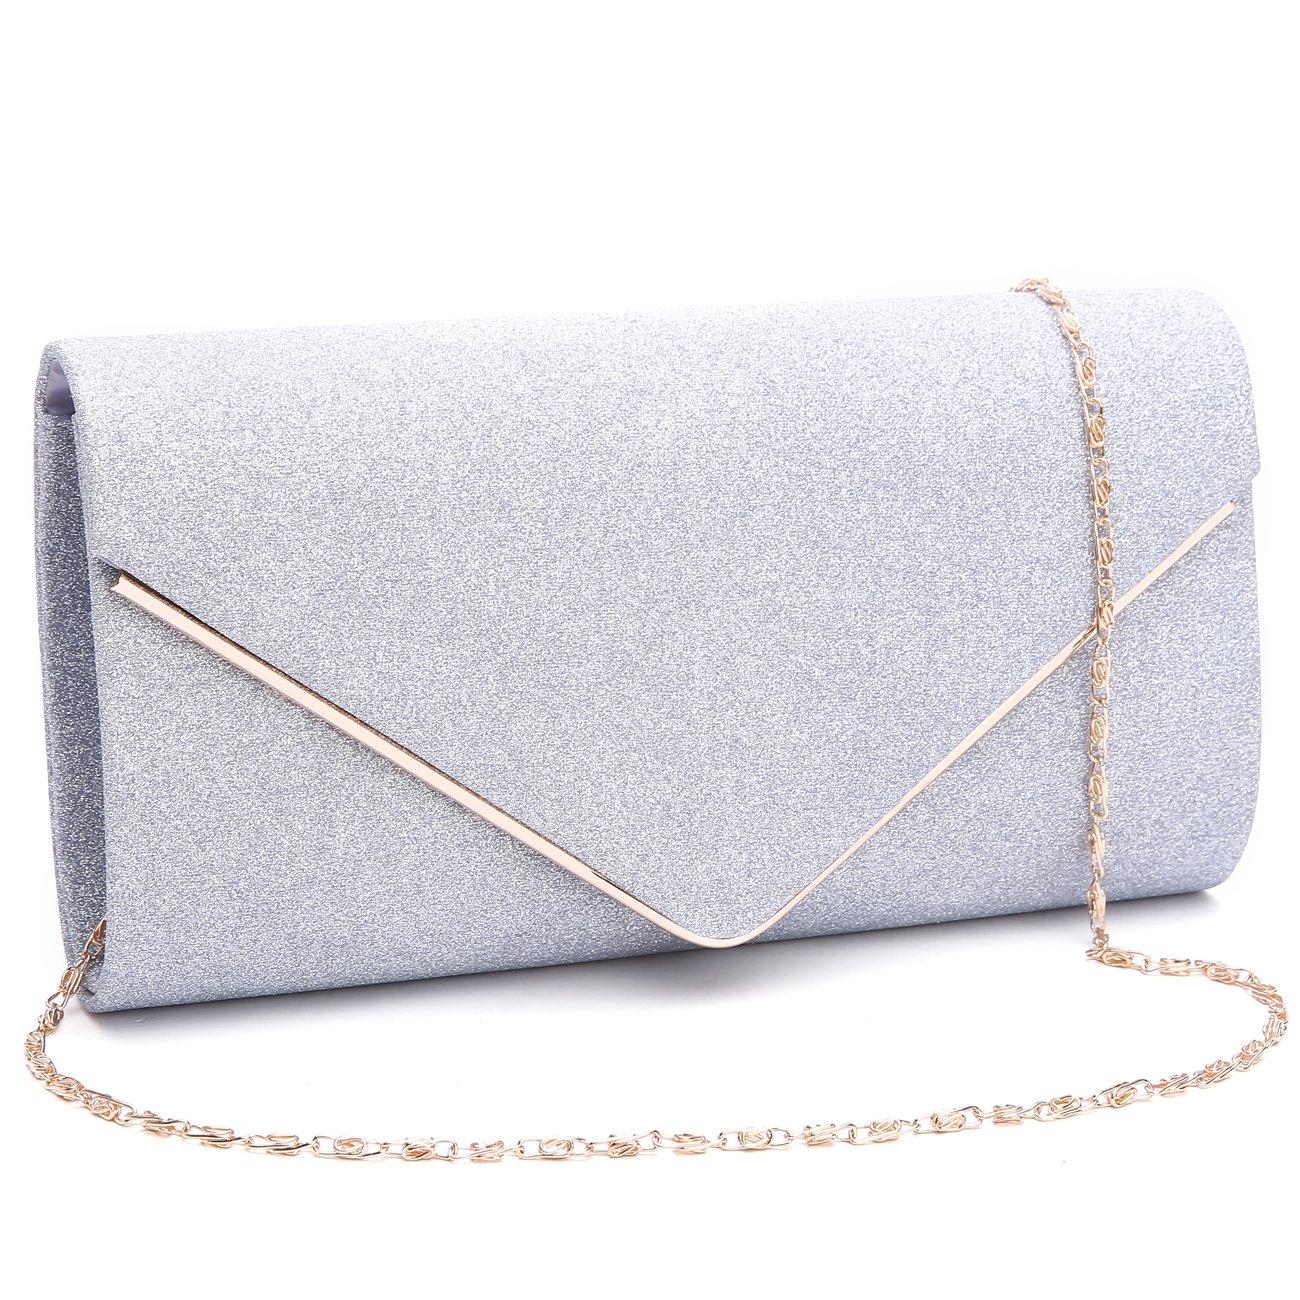 GESU Womens Shining Envelope Clutch Purses Glitter Evening Bag Handbags For Wedding and Party.(Silver) by GESU (Image #1)